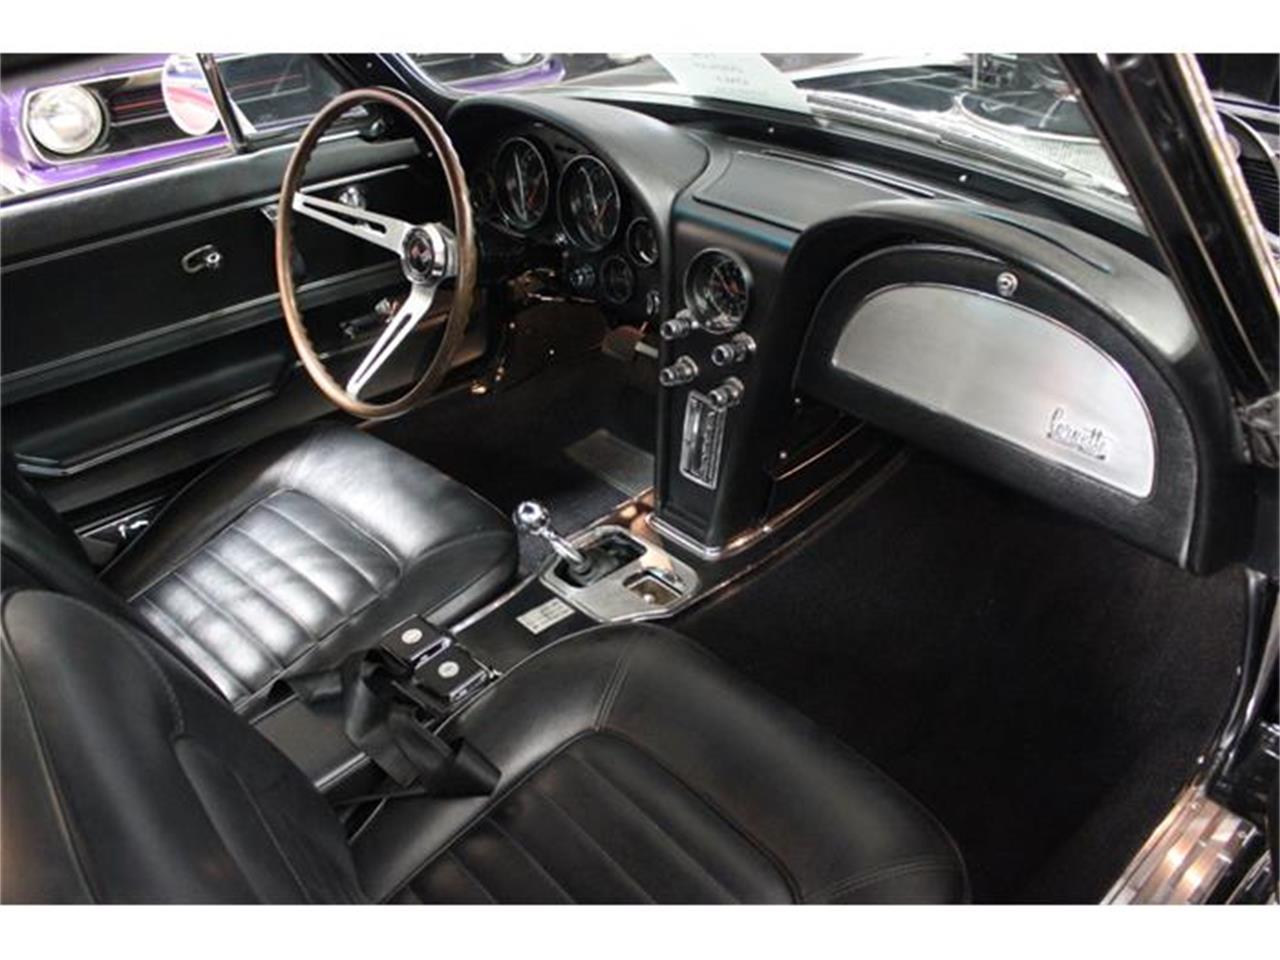 Large Picture of '66 Chevrolet Corvette located in San Diego California - $110,000.00 - EU77